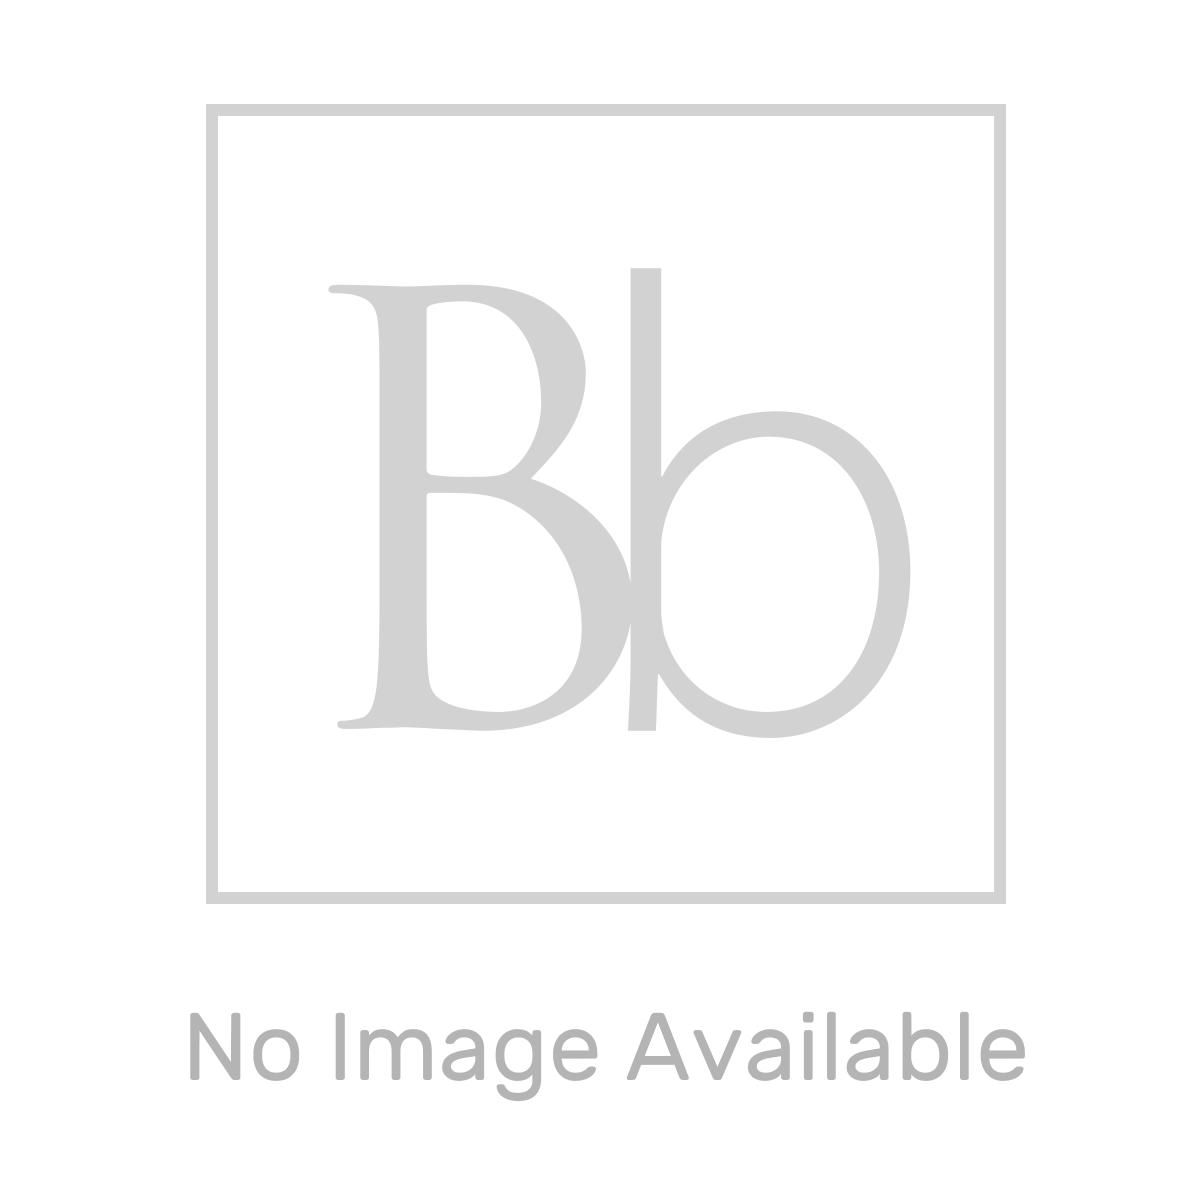 RAK Chrome Square Slide Rail Shower Kit with 3 Function Shower Head Measurements